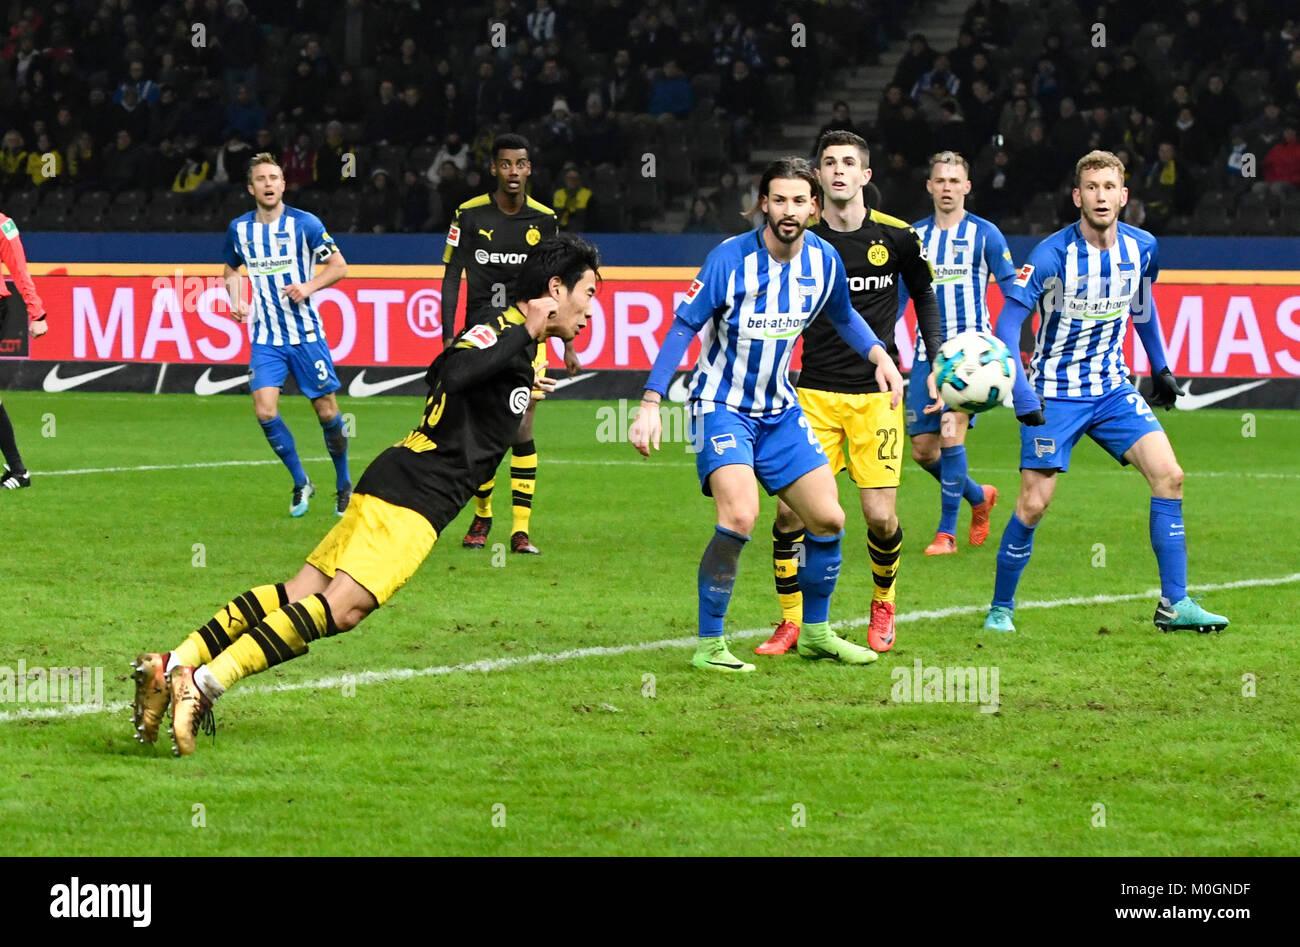 Berlin, Deutschland. 19 Jan, 2018. Shinji KAGAWA (DO, vo. li.) erzielt per Kopfball das Tor zum 1:1, Erfolg, Treffer, Stockbild